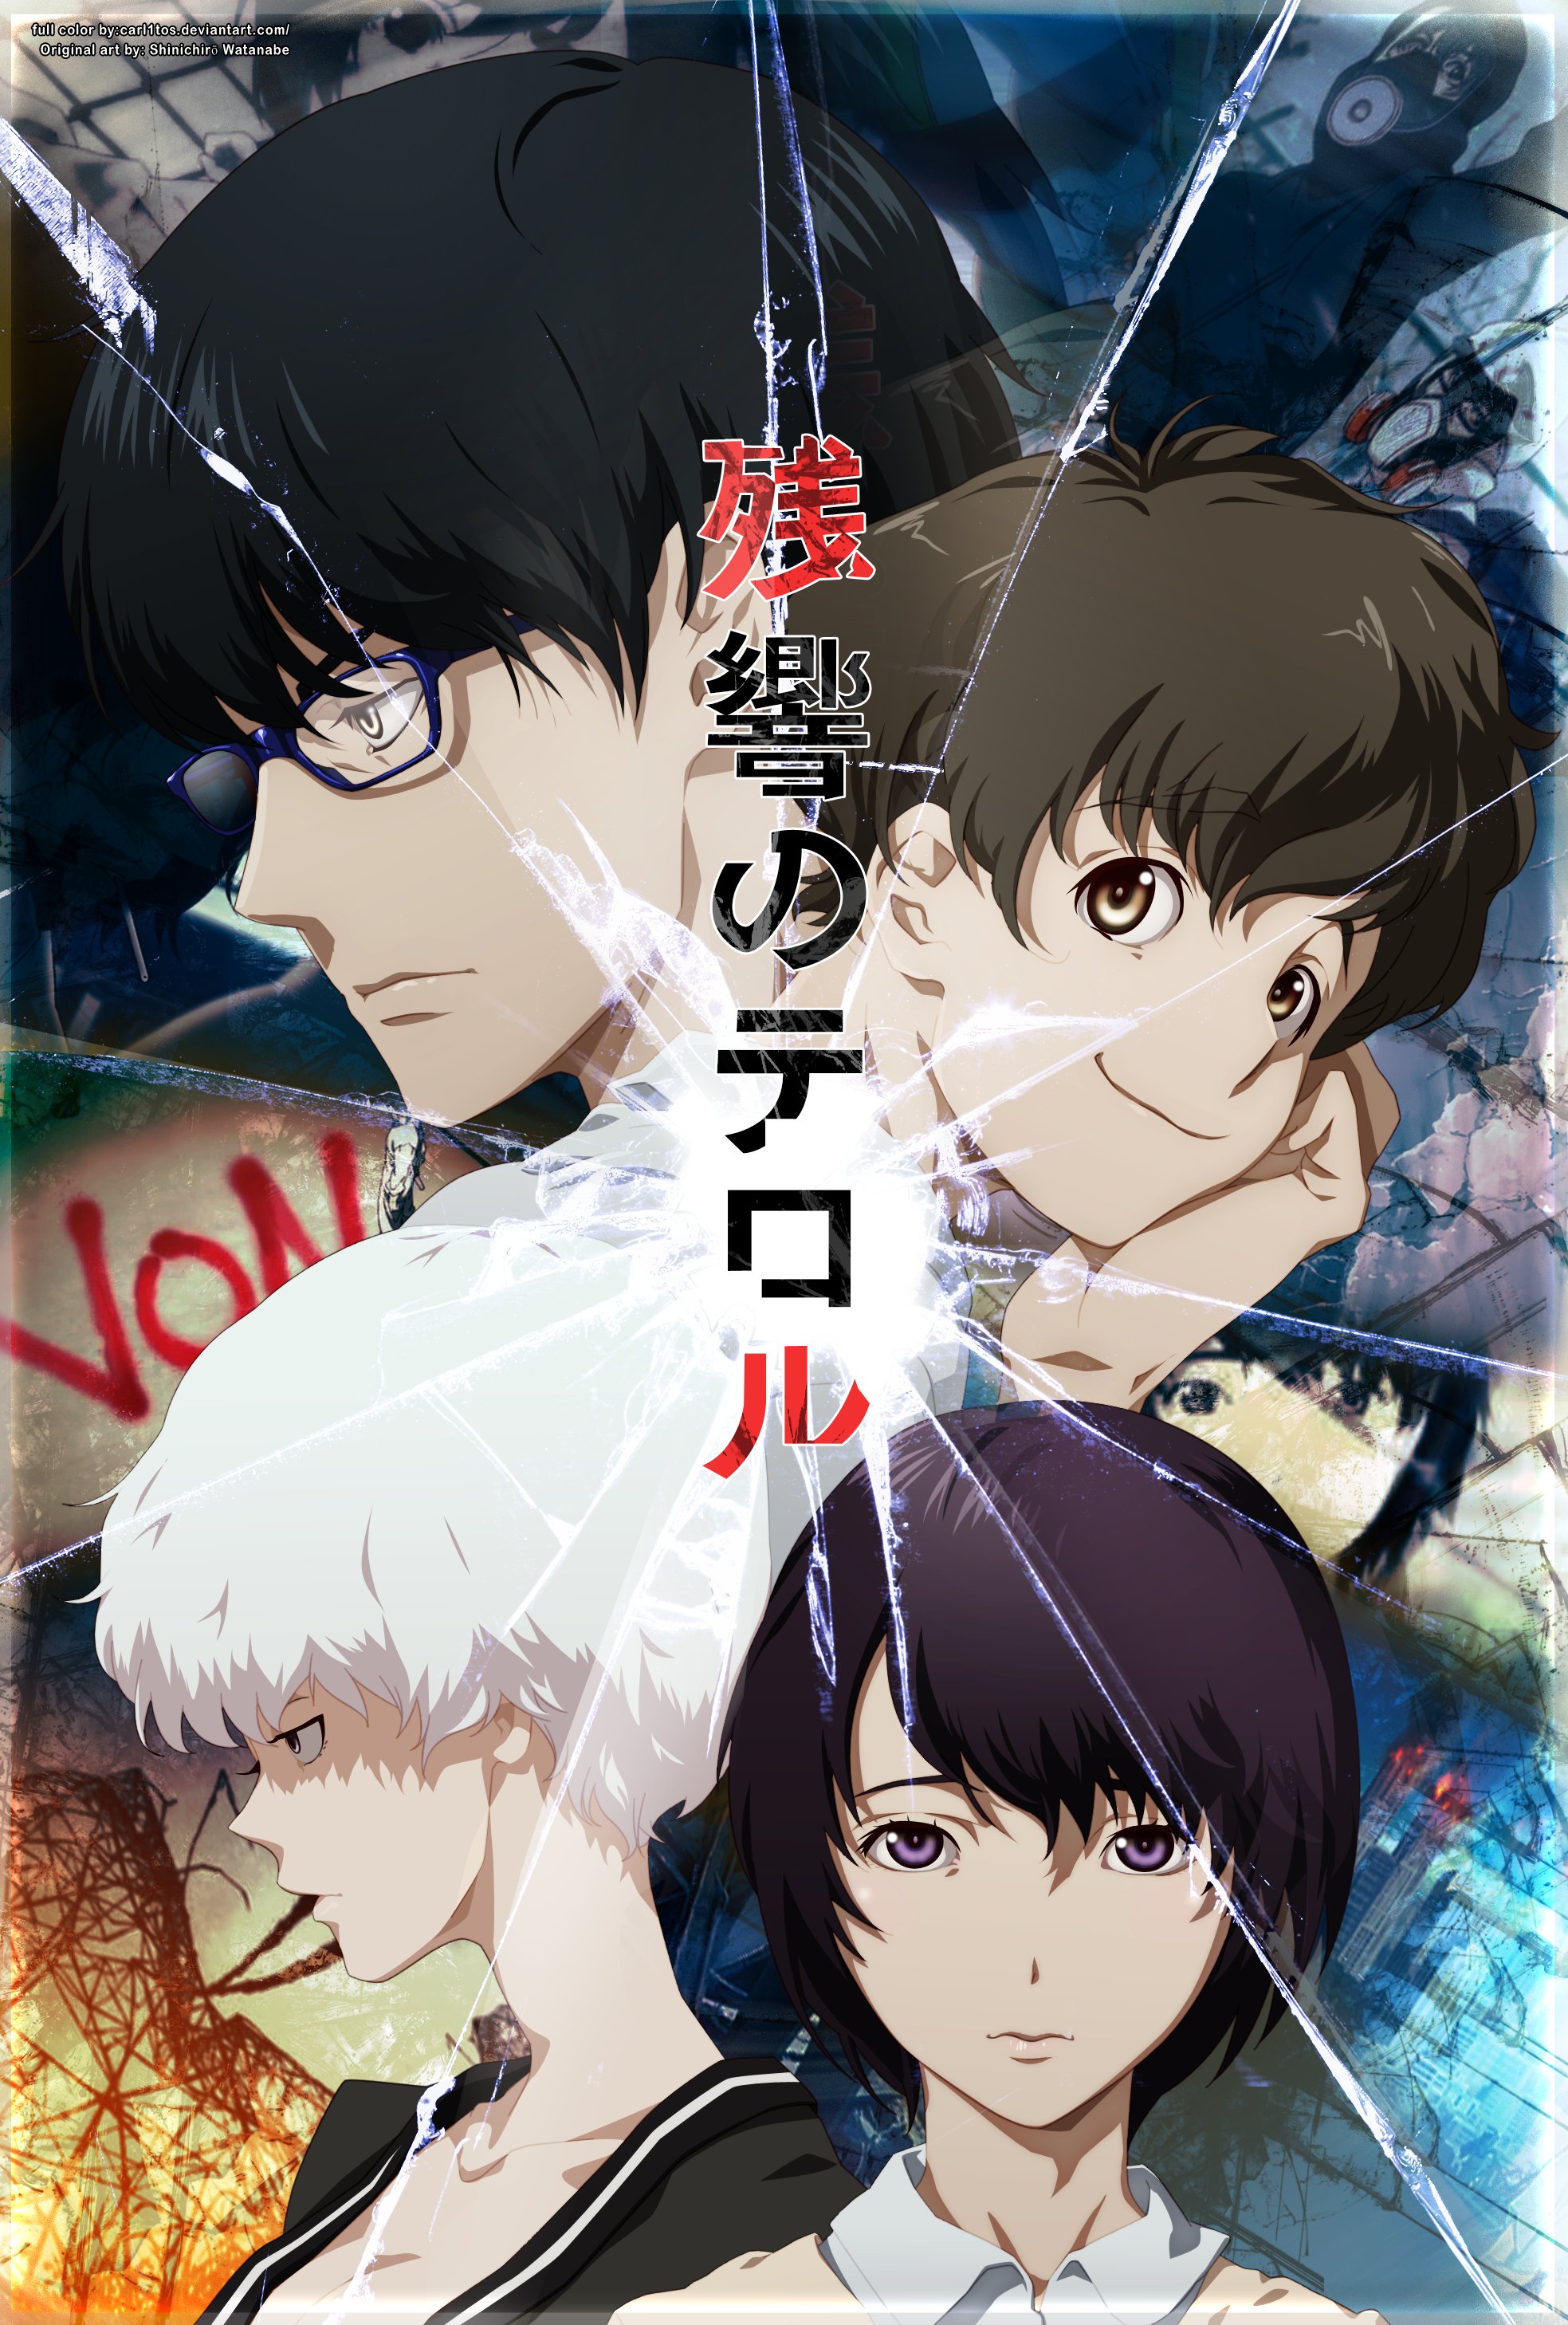 El rincon de Perpi: Anime Reseña: Zankyou no Terror